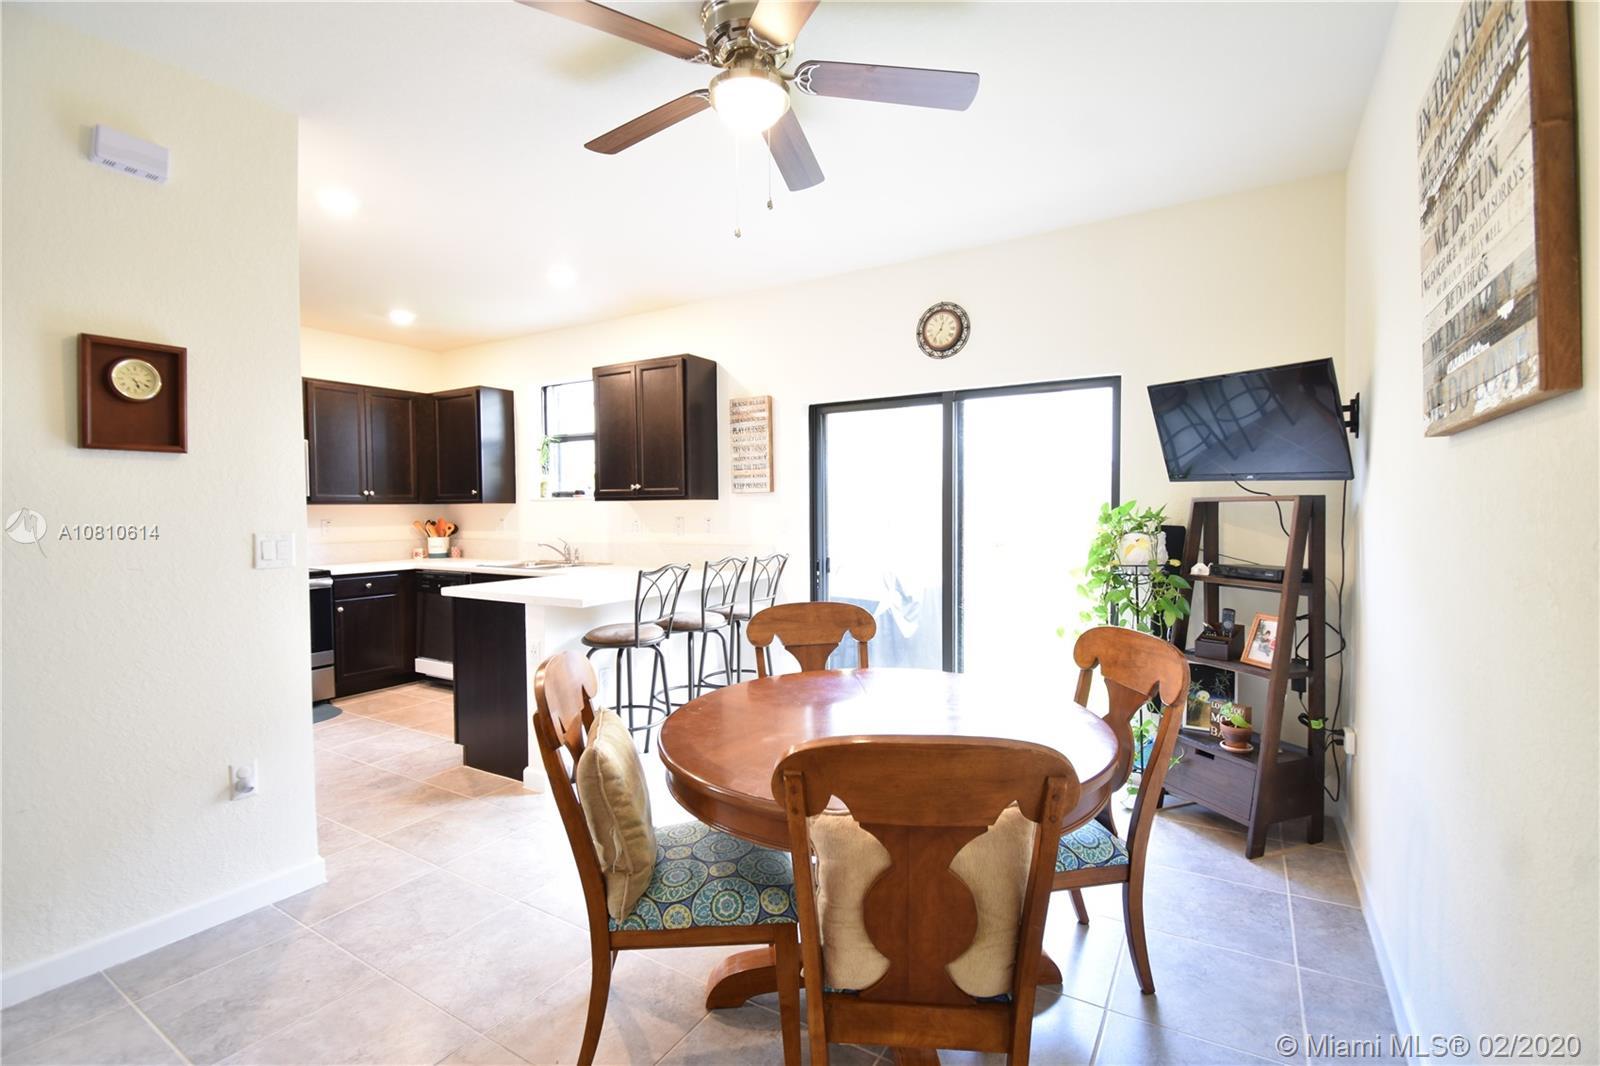 153 SE 33rd Pl #n/a, Homestead, FL 33033 - Homestead, FL real estate listing